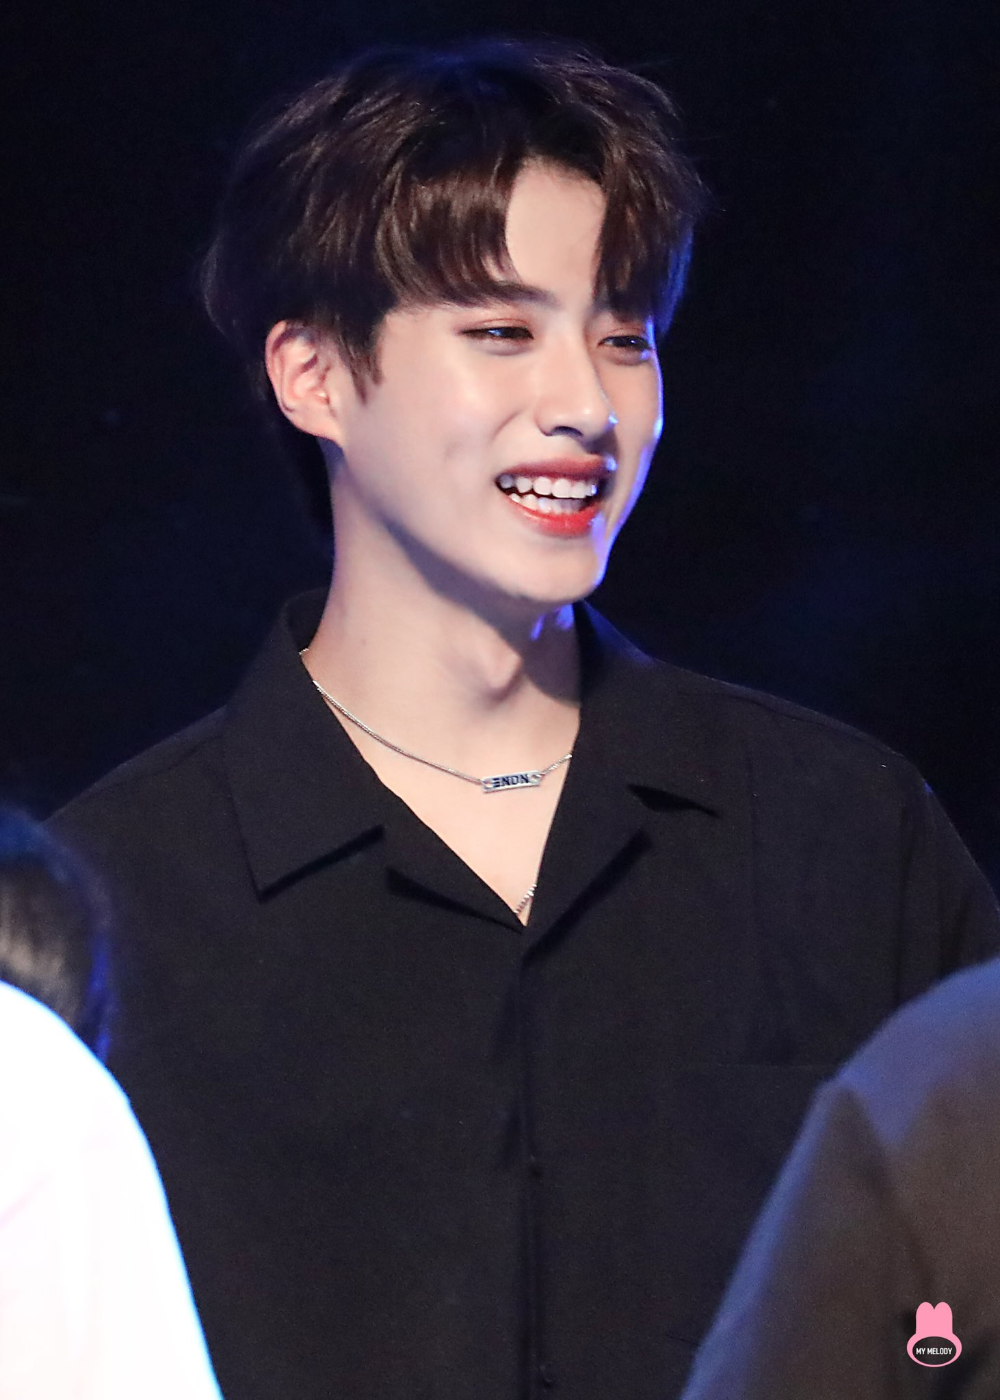 Xion Life On Twitter Beautiful Smile Kpop Idol Boy Groups